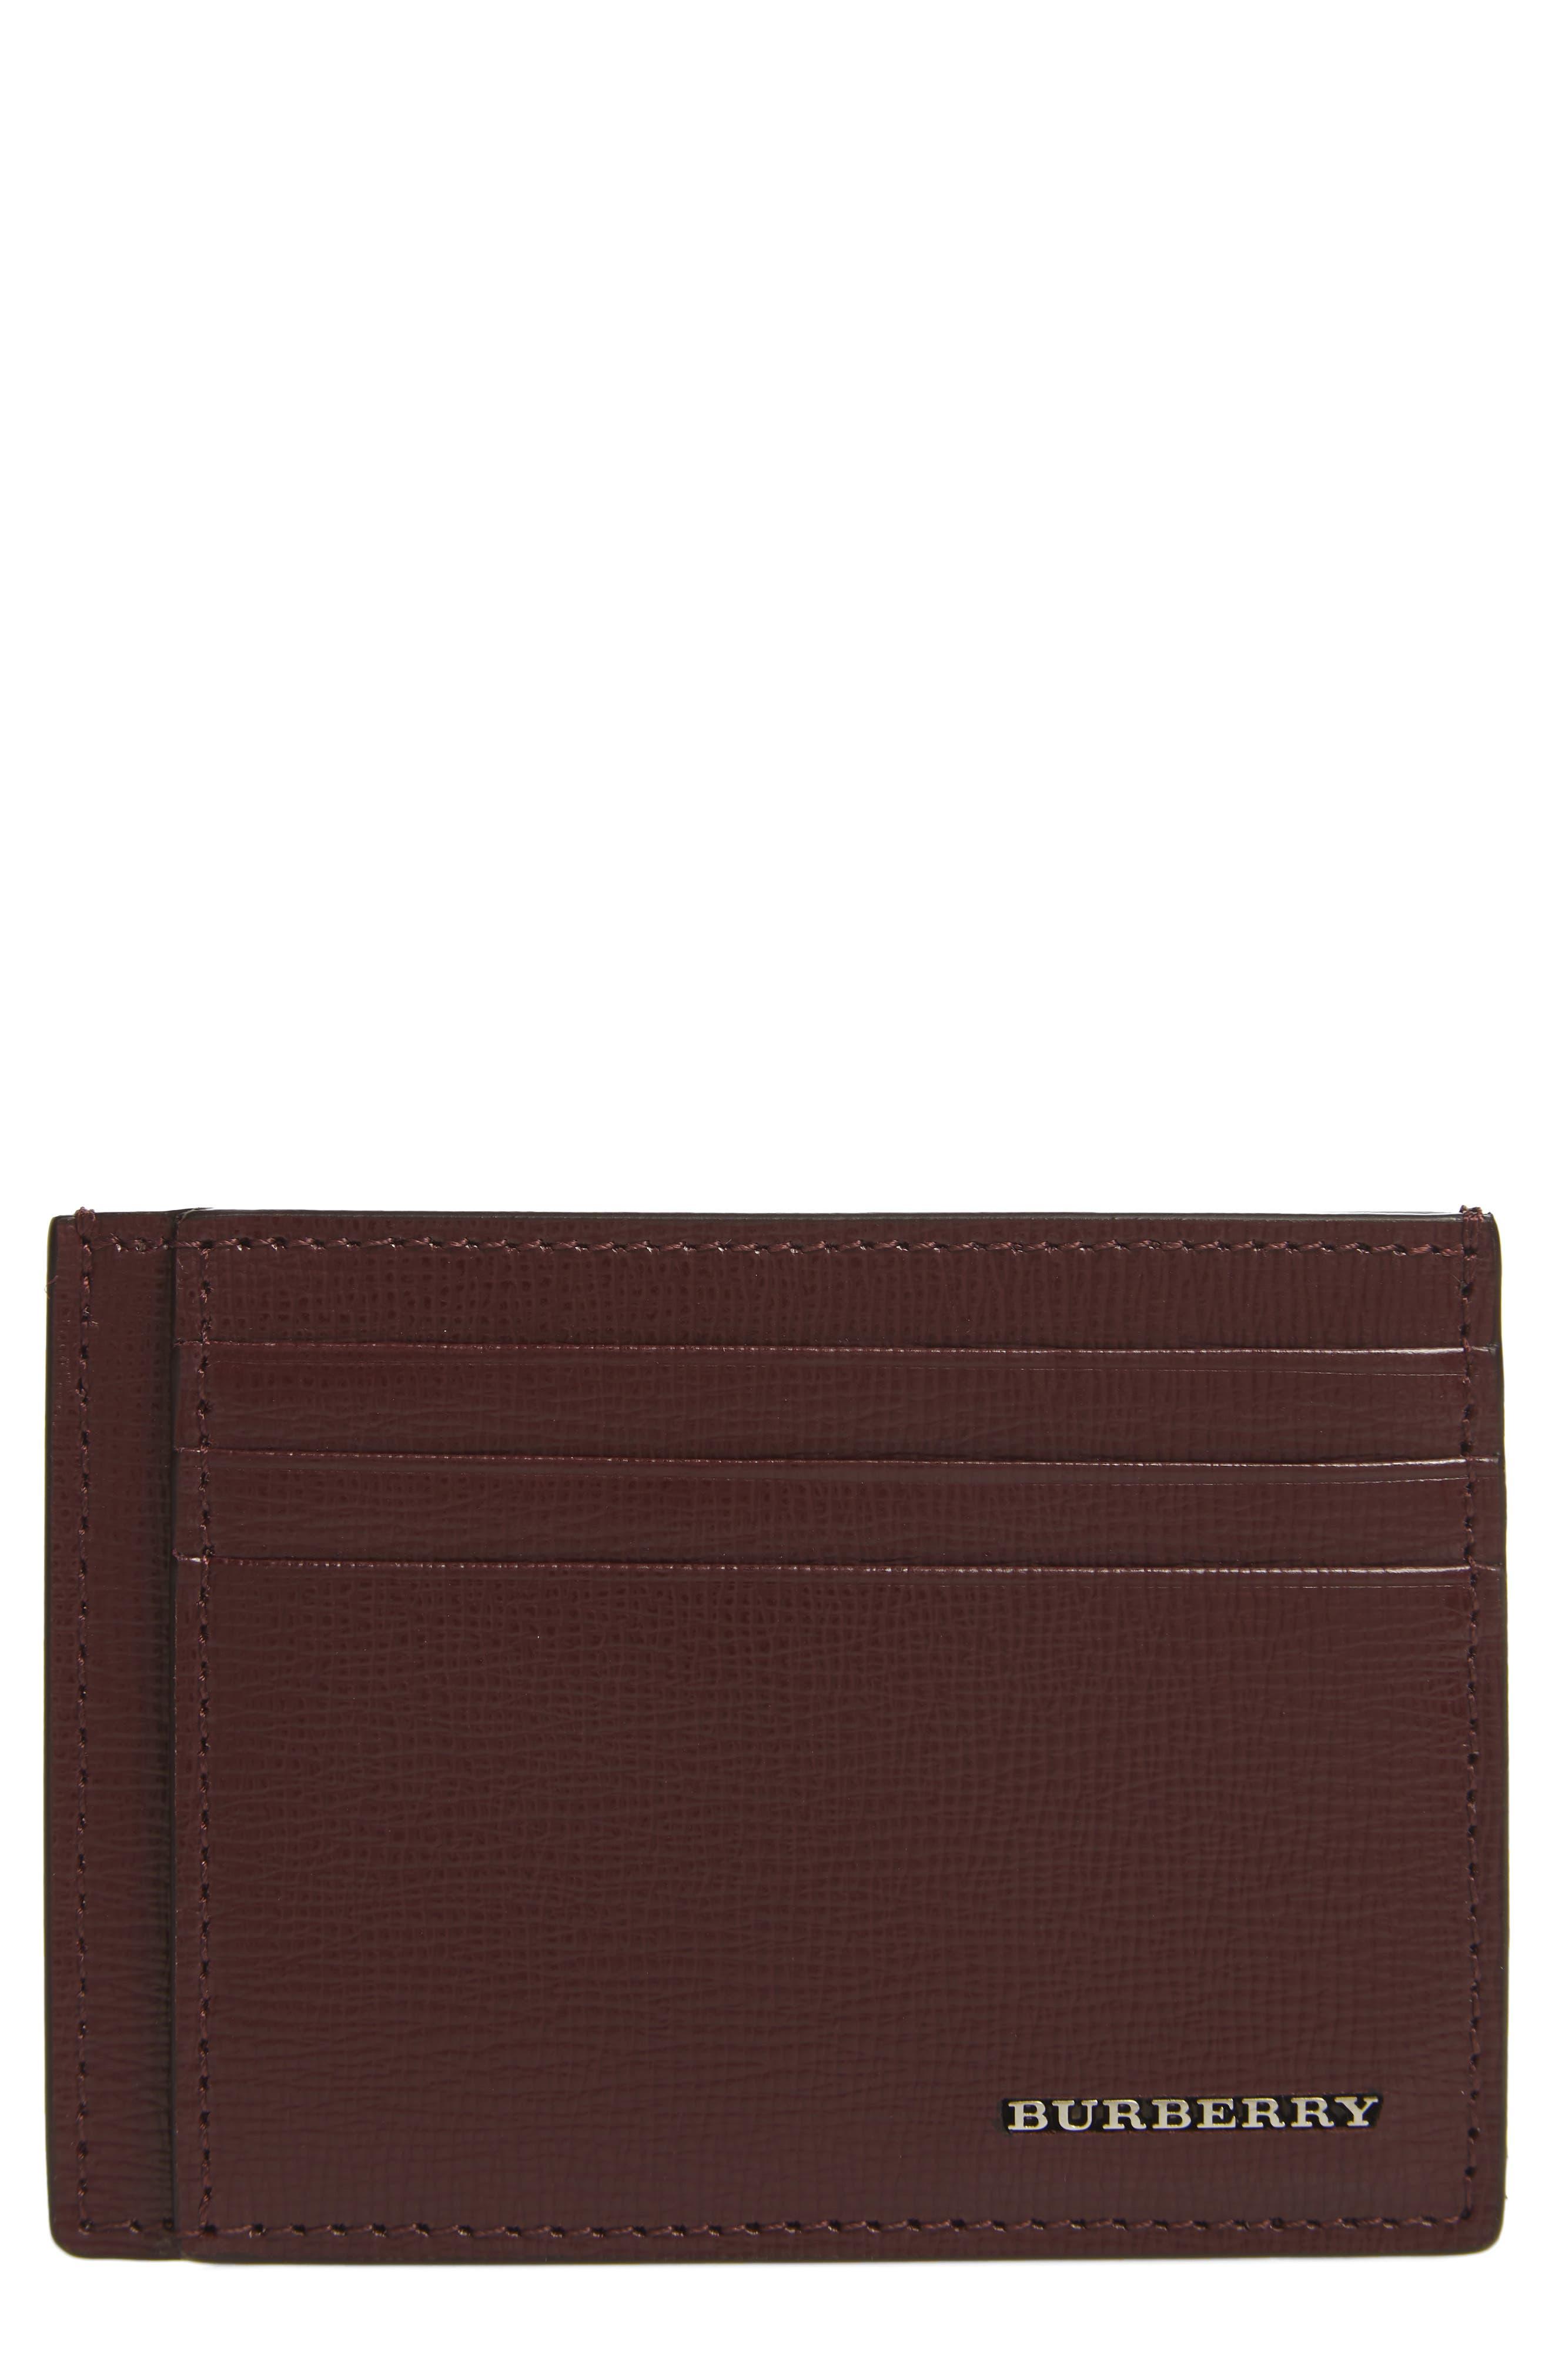 Bernie Check Card Case,                             Main thumbnail 1, color,                             935